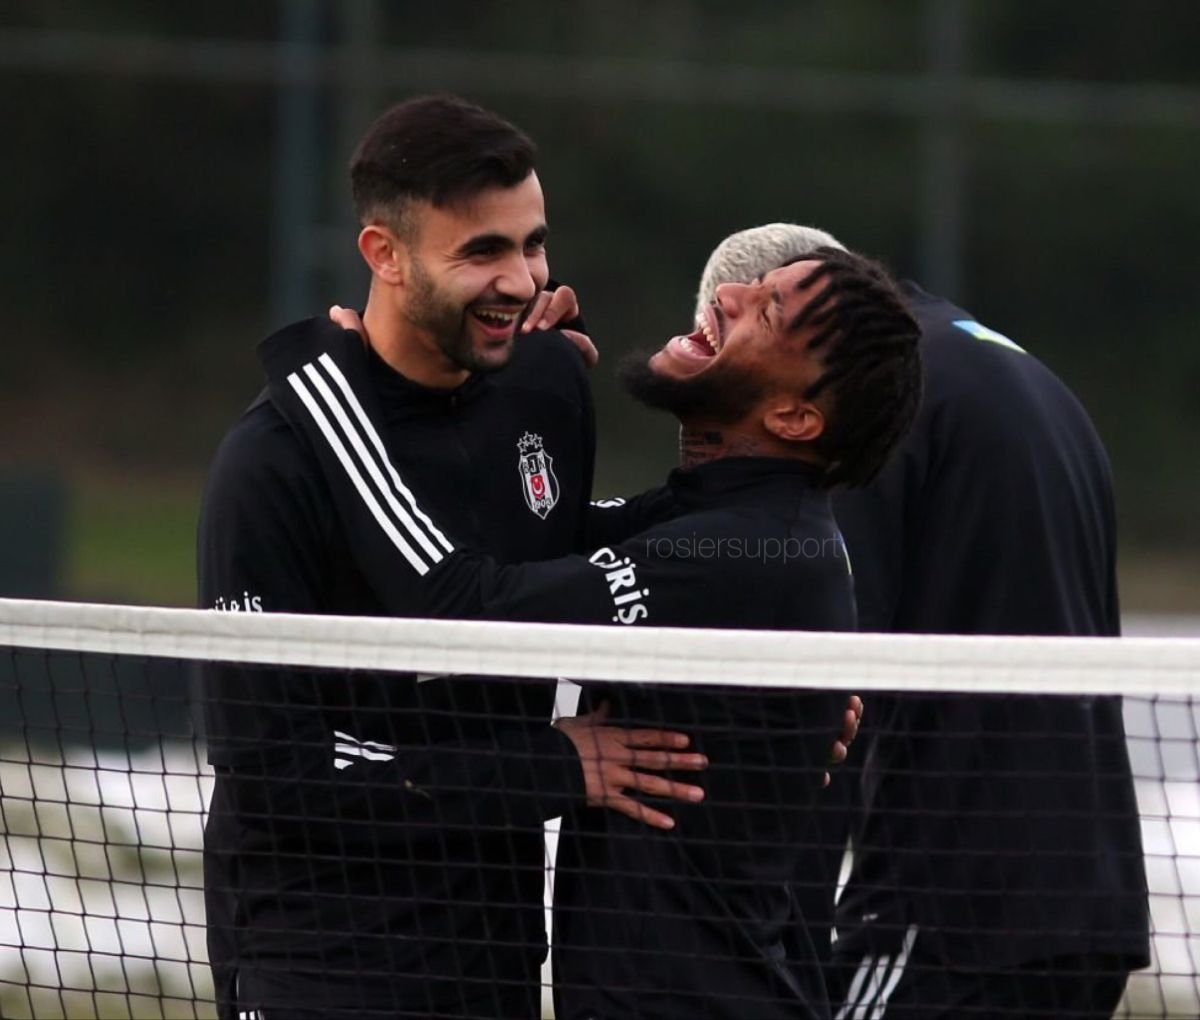 Valentin Rosier: Come to Beşiktaş Rachid #1